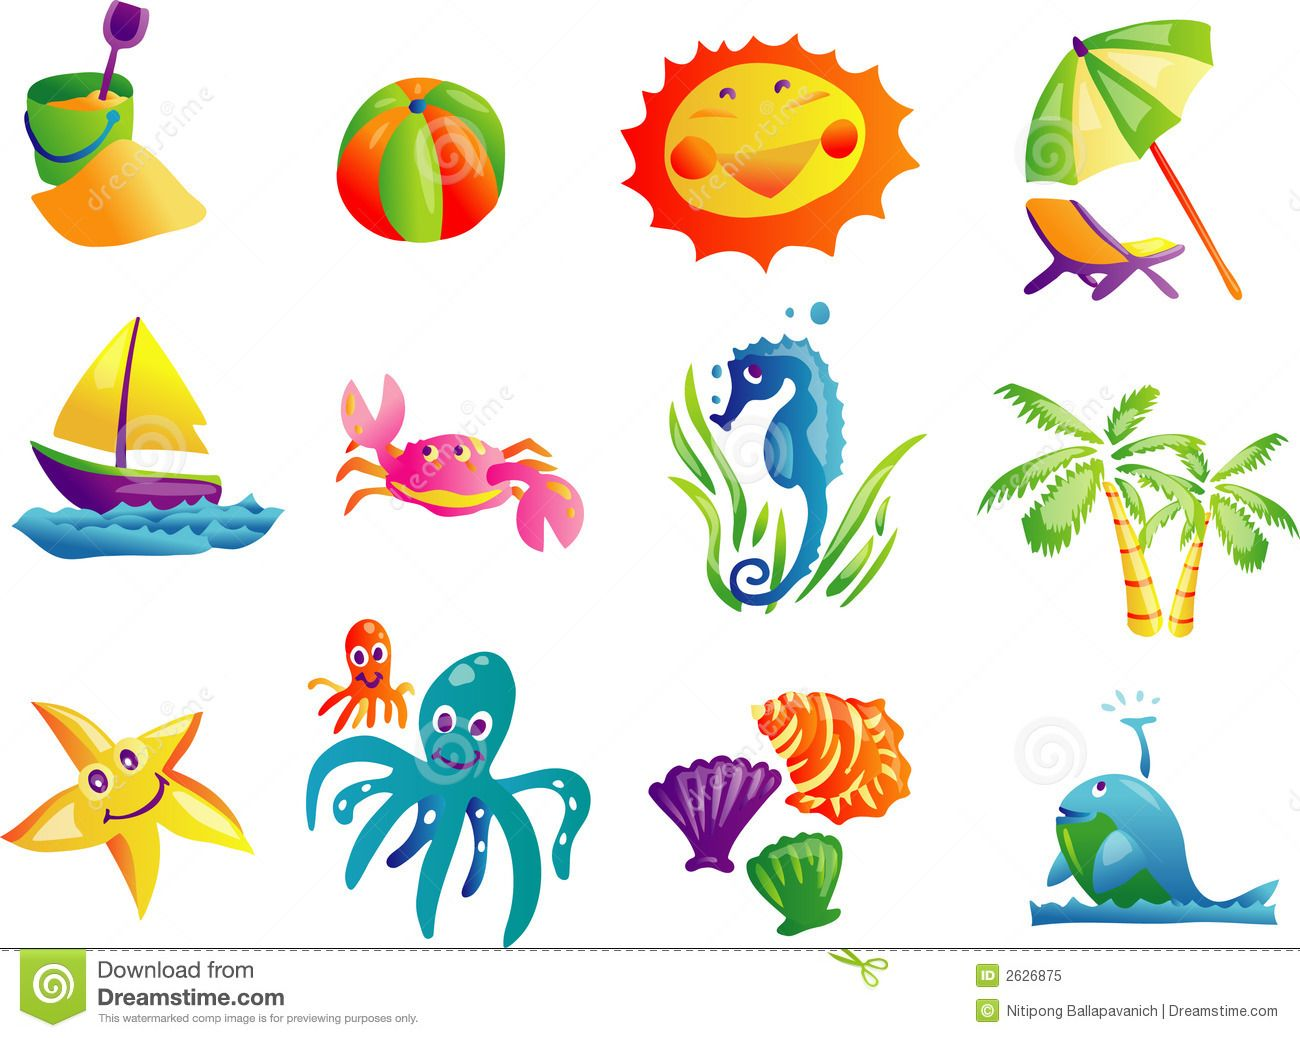 Sunny vacation clipart clip art free summer vacation clip art black and white - חיפוש ב-Google ... clip art free